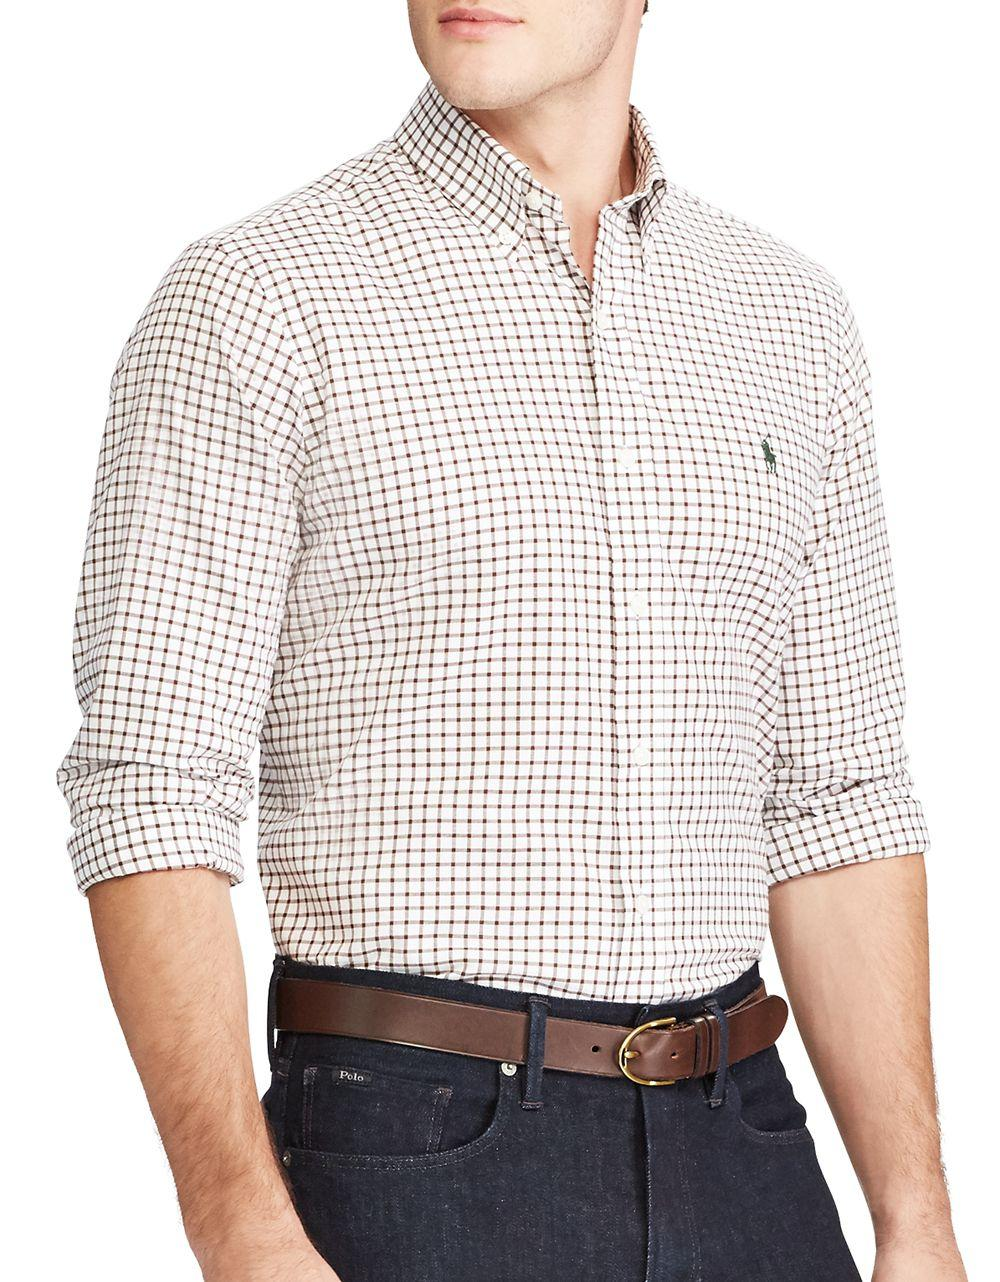 Polo ralph lauren gingham cotton casual button down shirt for Polo ralph lauren casual button down shirts